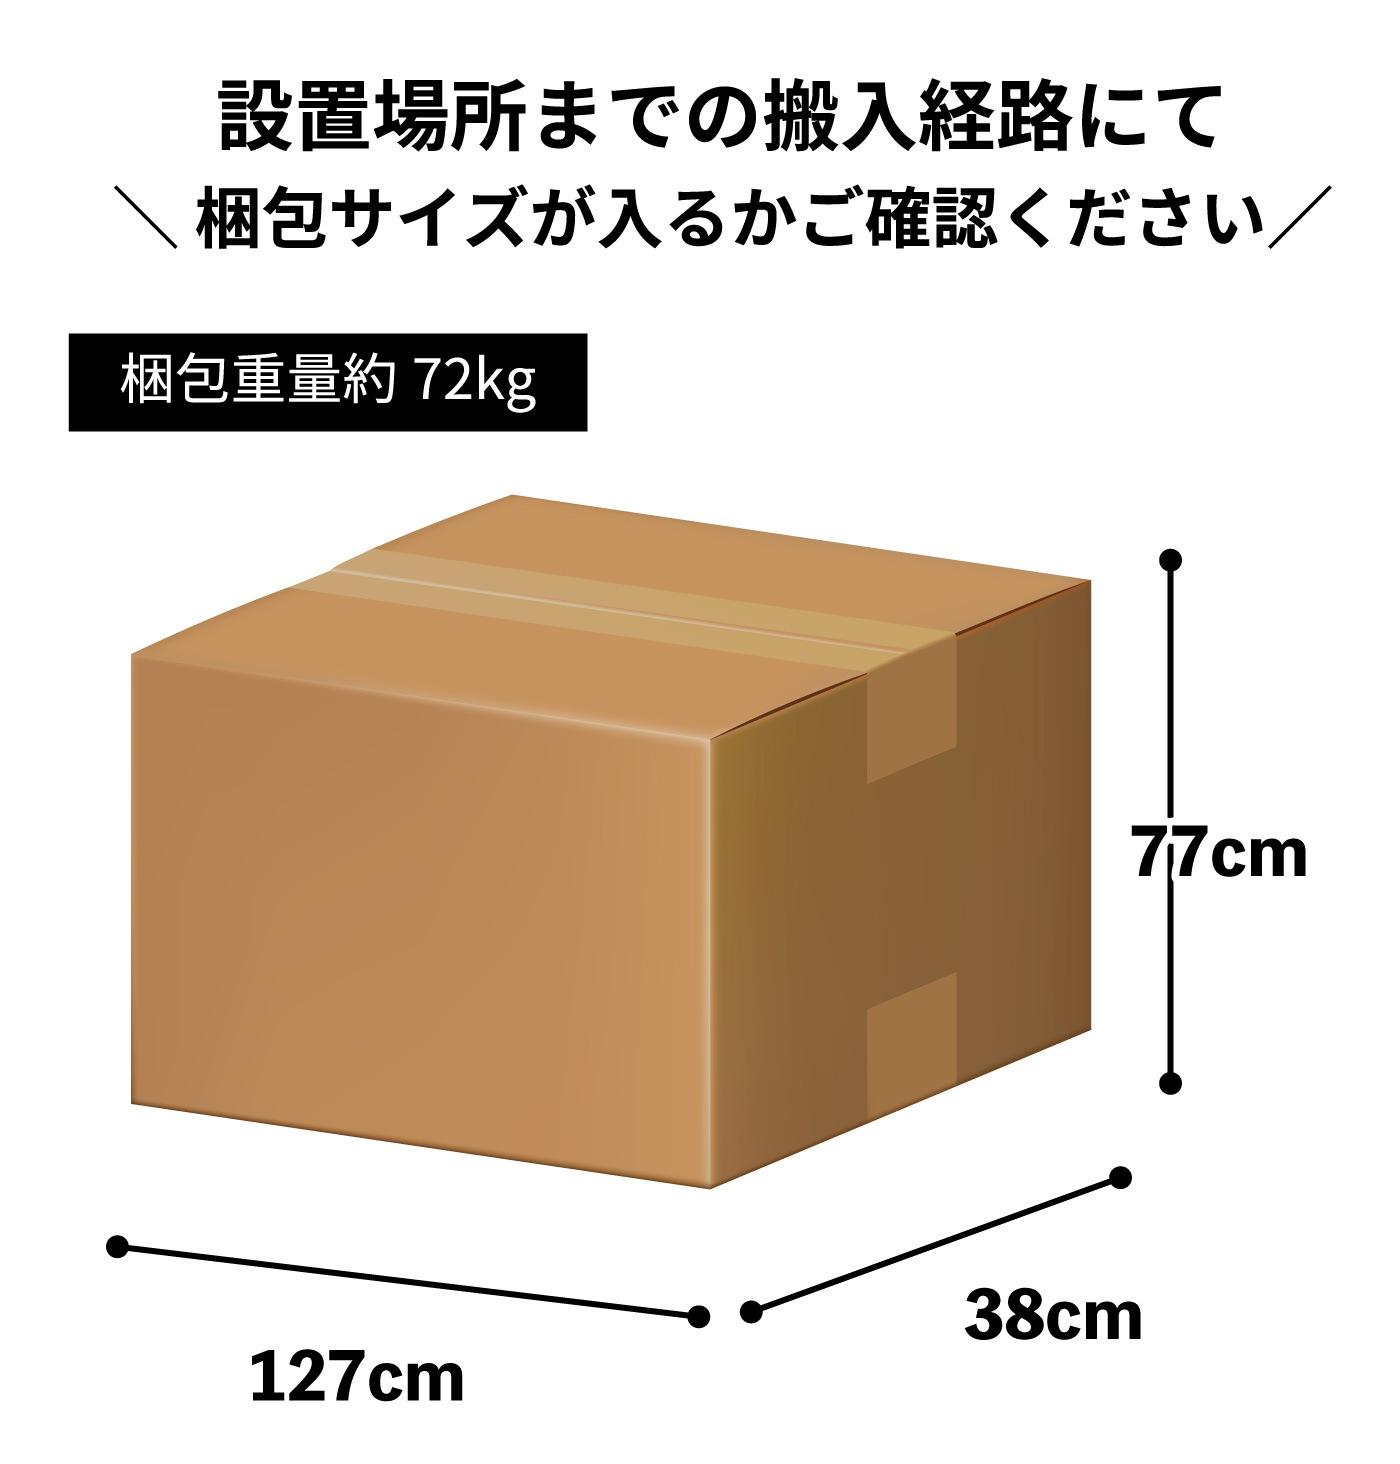 DK-B11の梱包サイズ